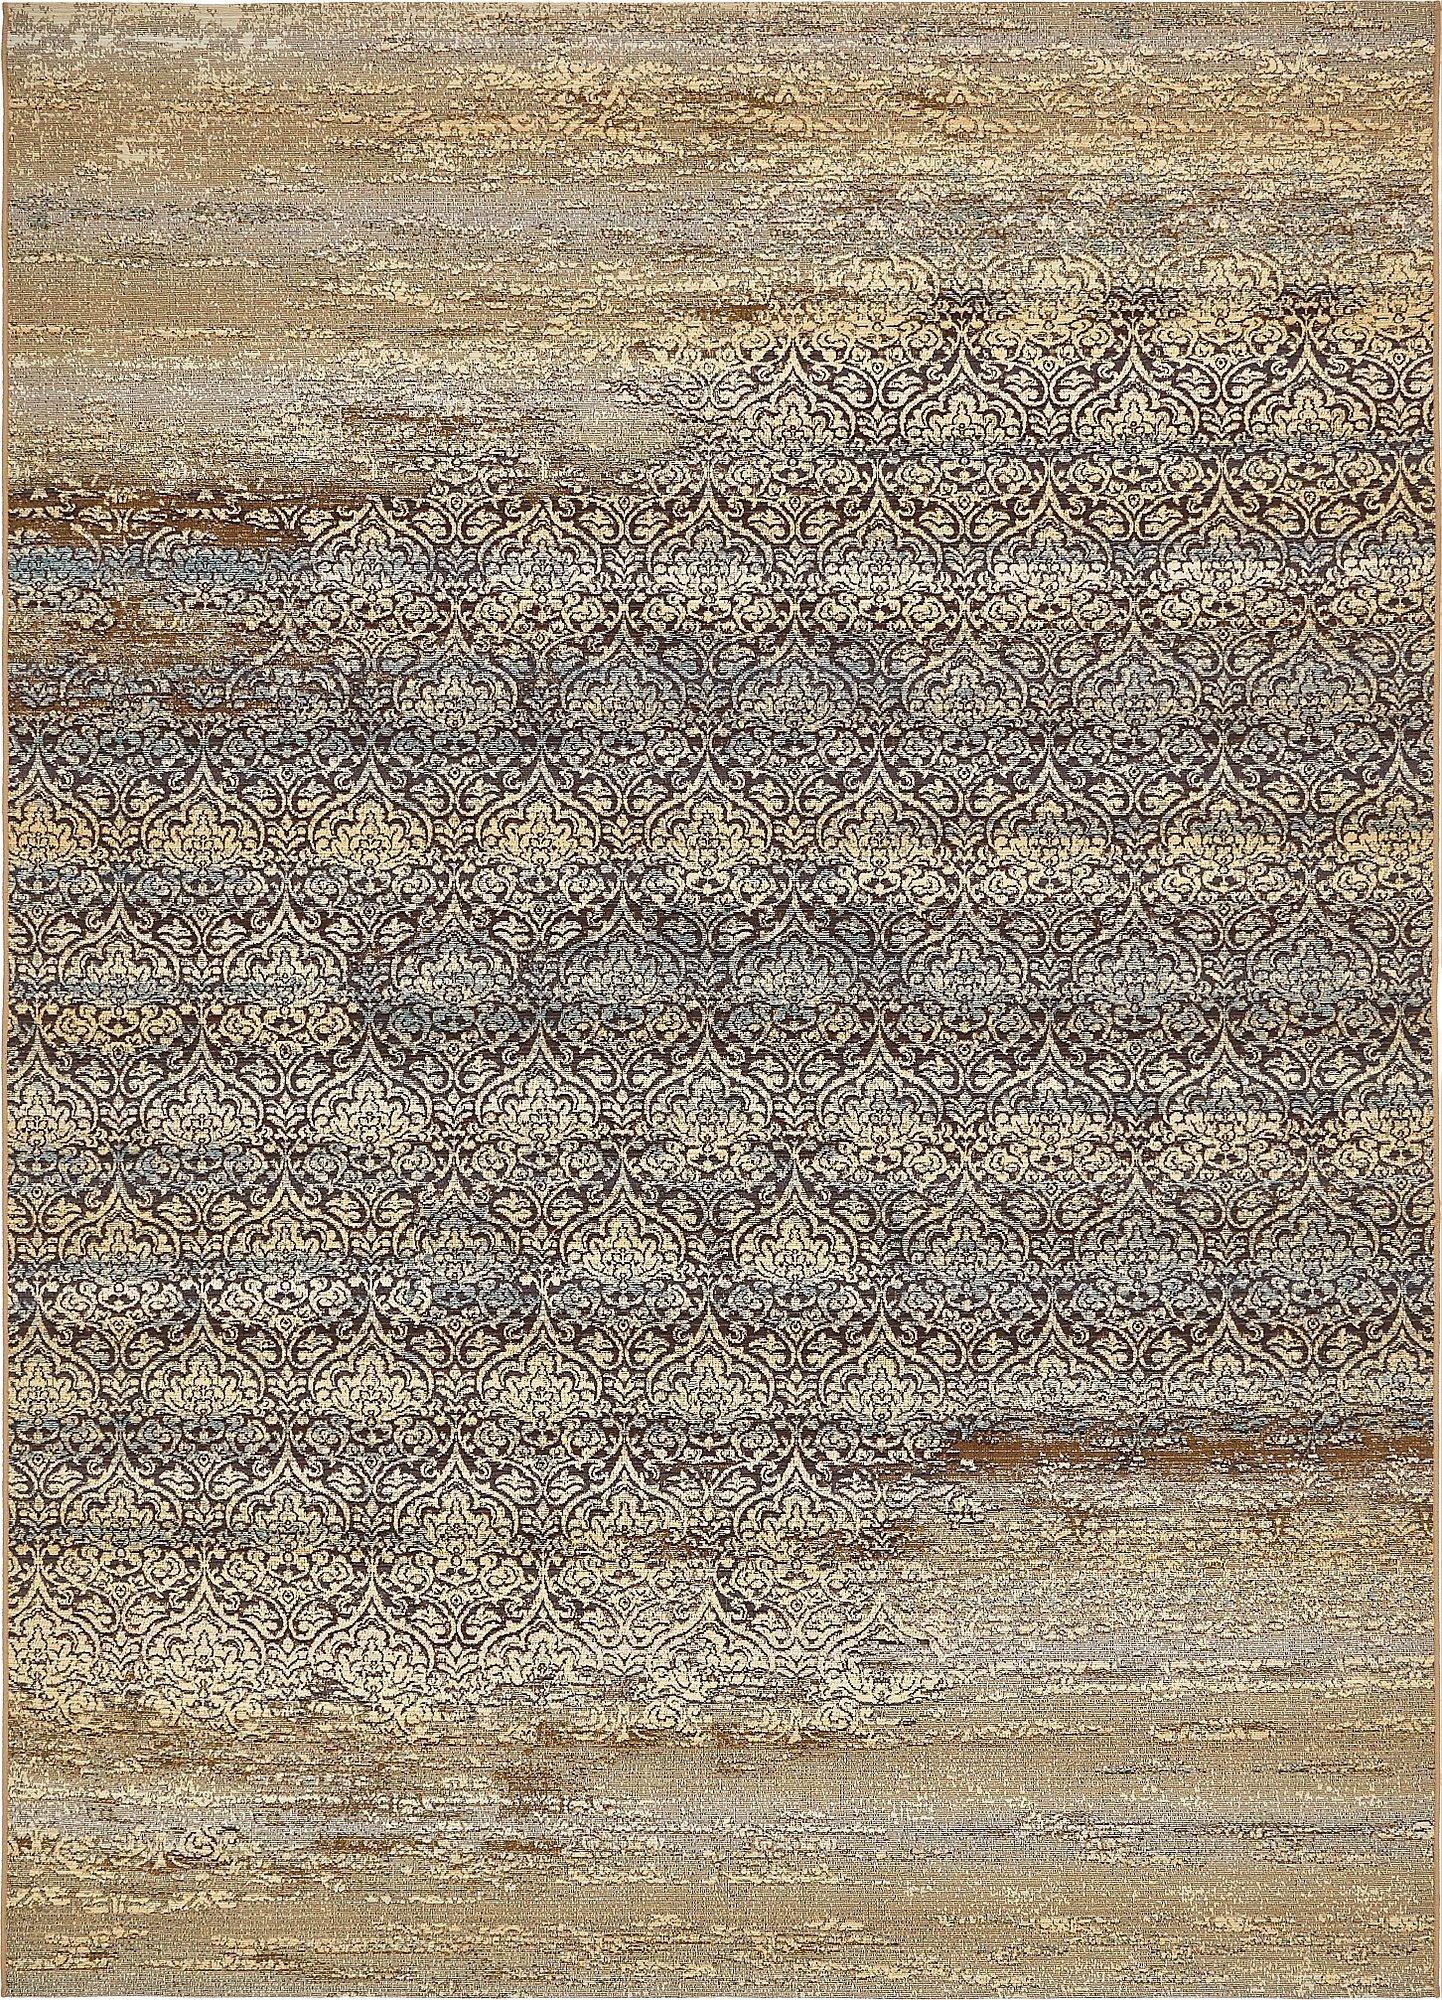 Unique Loom Eden Outdoor Collection Beige 8 x 11 Area Rug (8' x 11' 4'')